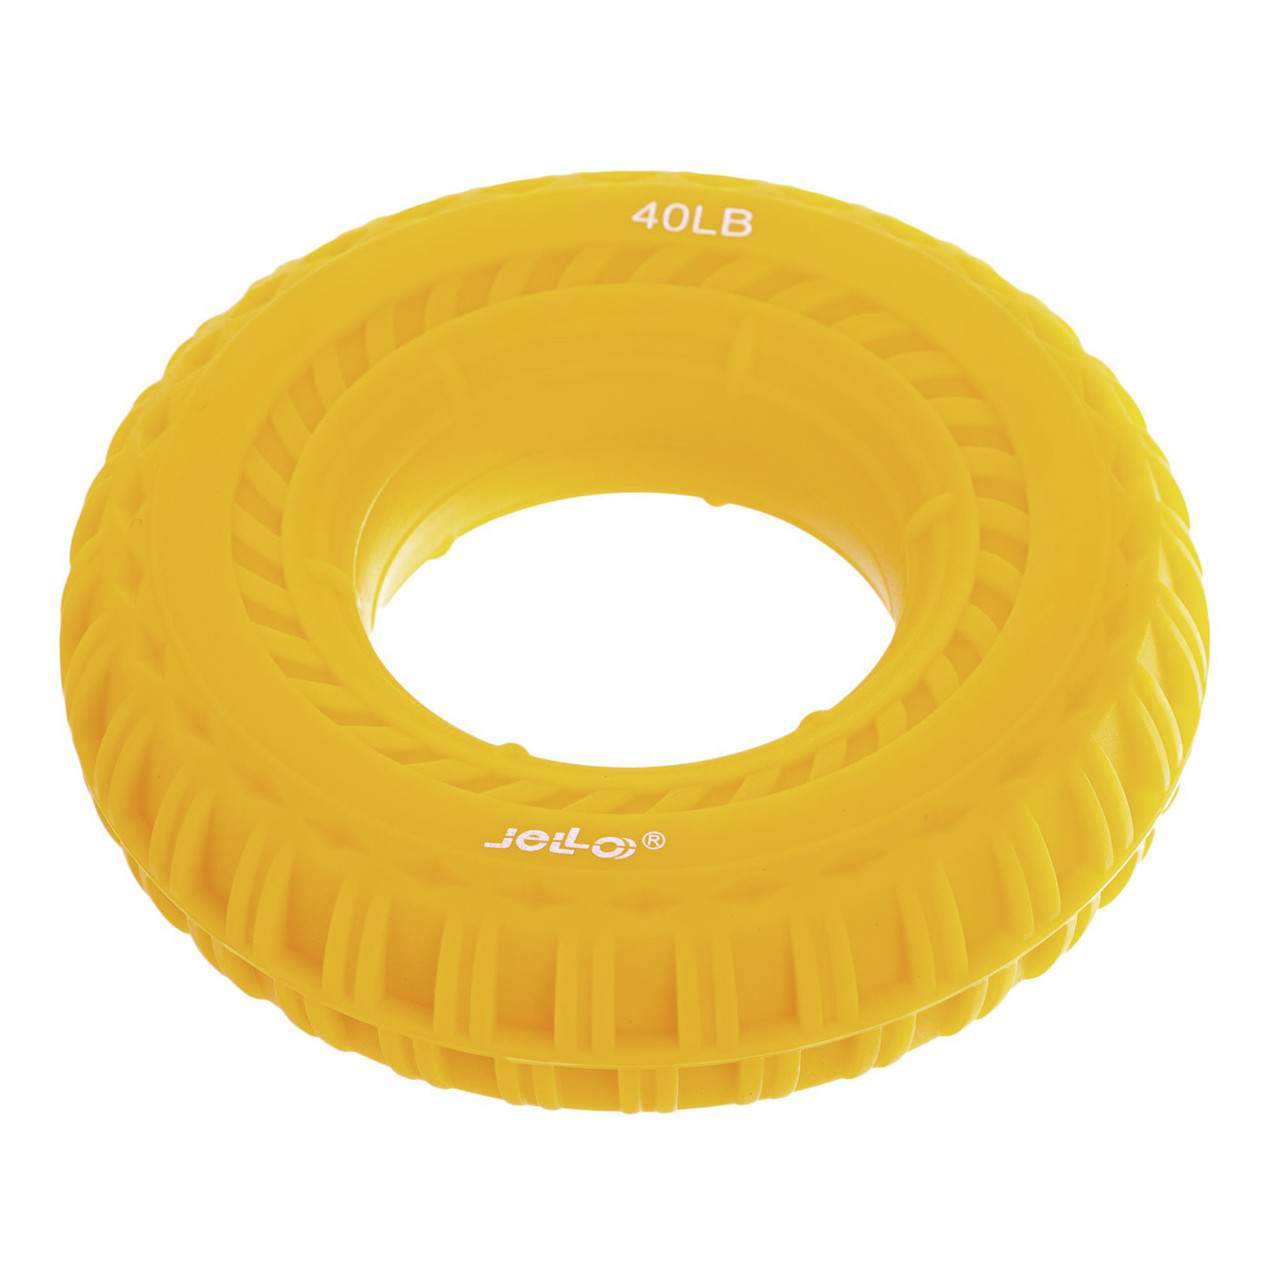 Эспандер кистевой Кольцо 40LB JELLO (силикон, нагрузка 40LB(18кг), желтый)